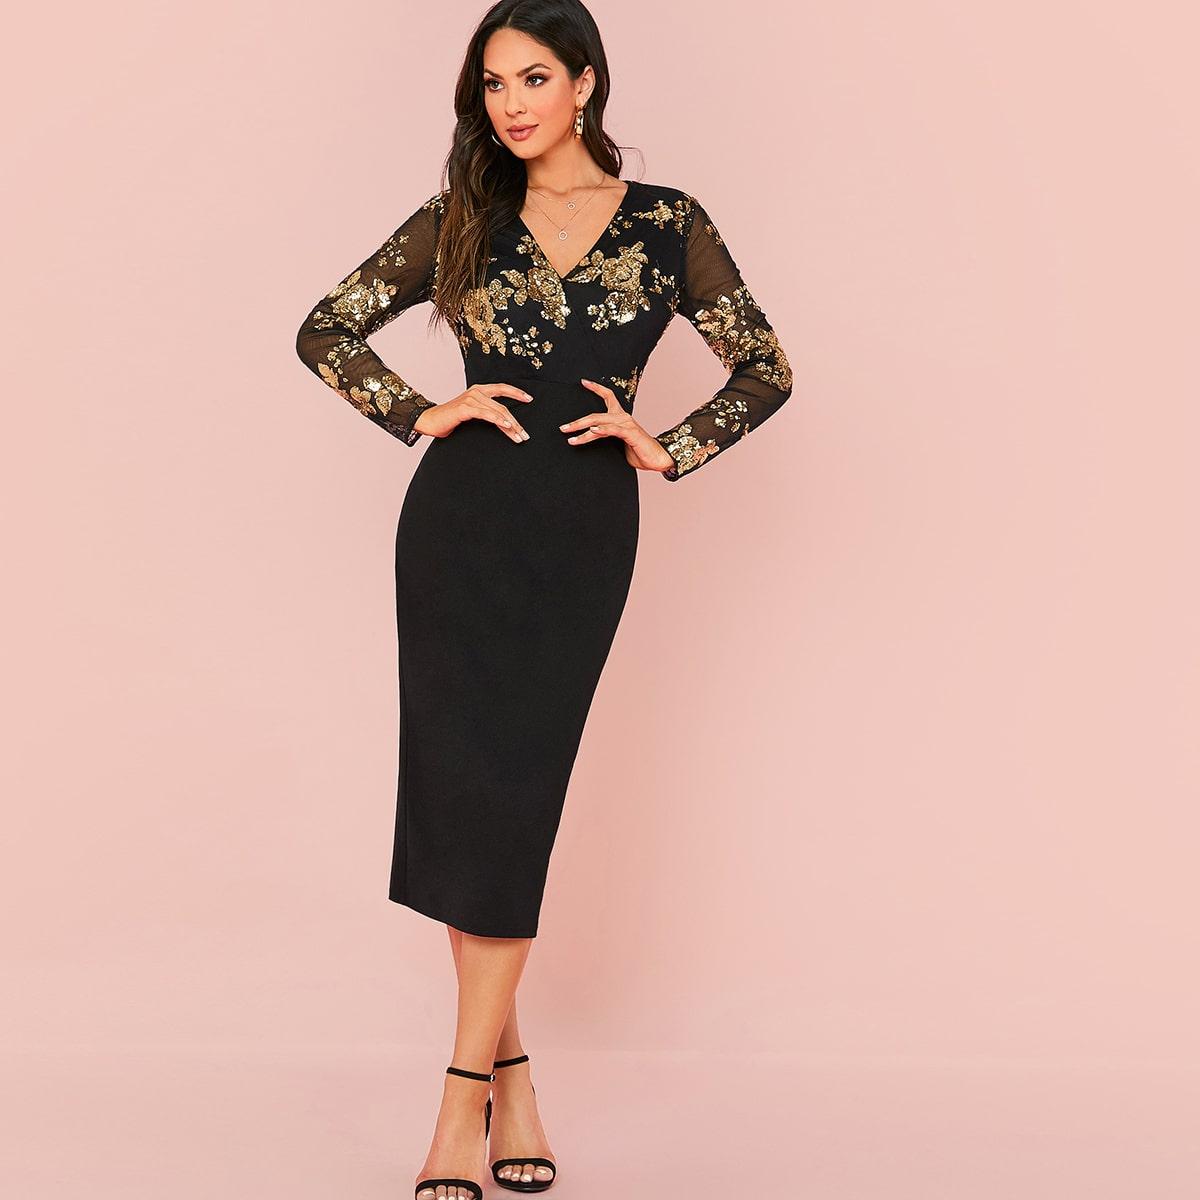 SHEIN / Surplice Neck Sequin Mesh Overlay Bodice Dress